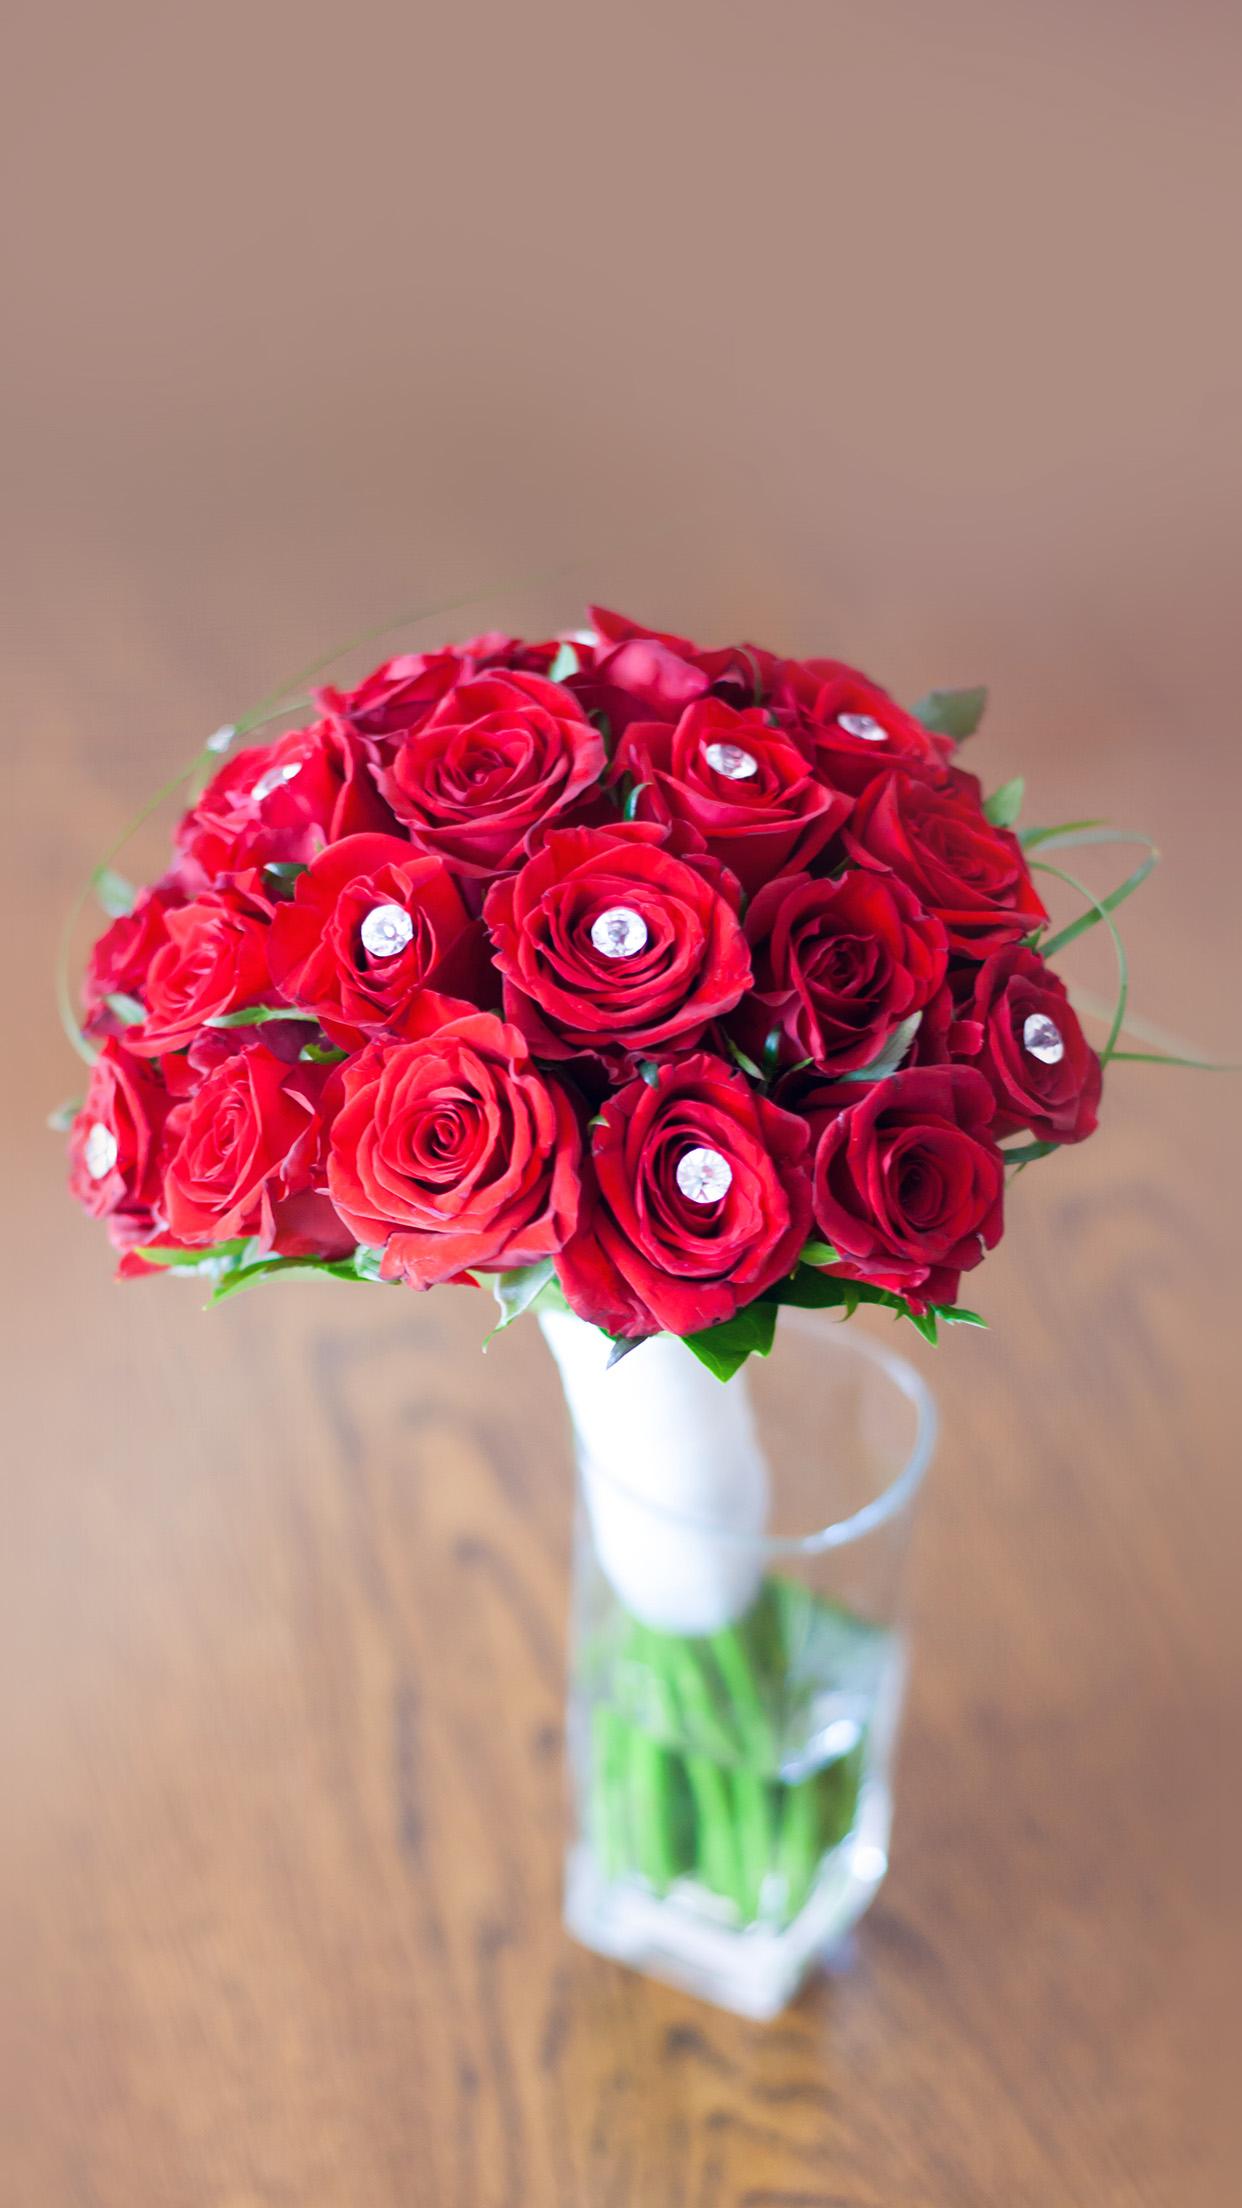 Flower Red Vase Life Art Nature Rose Sprin Android Wallpaper